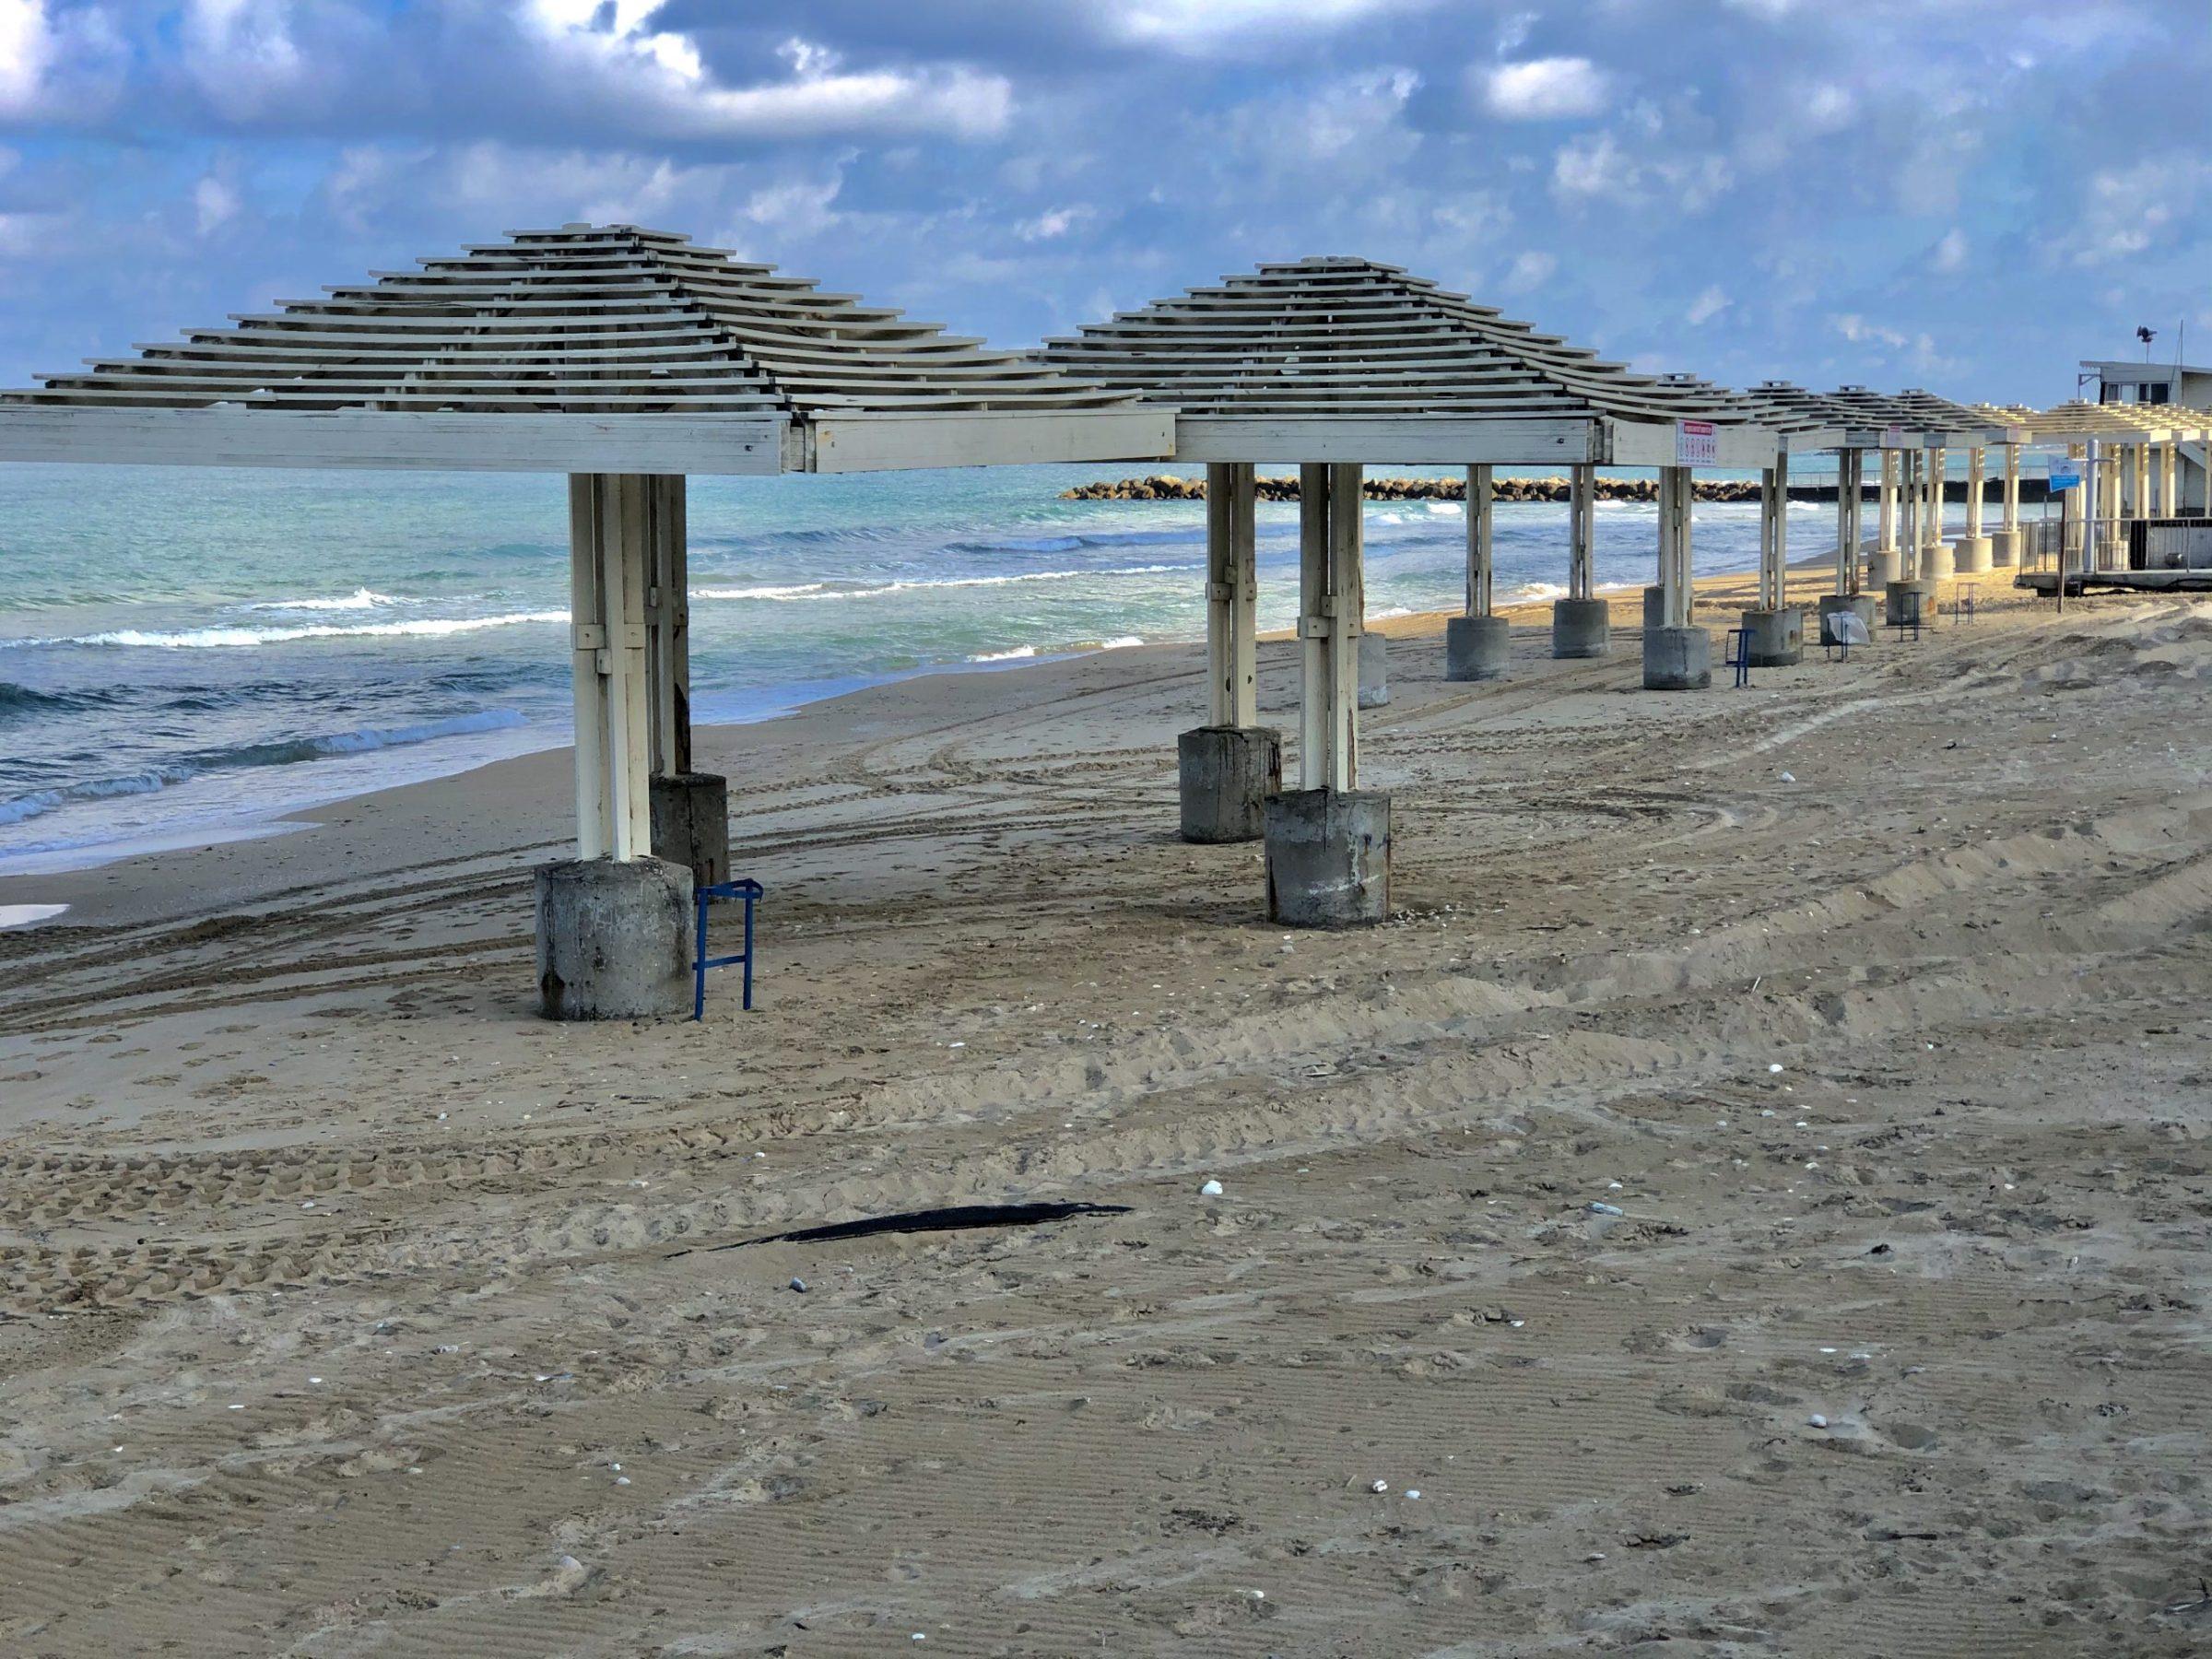 Israeli beaches